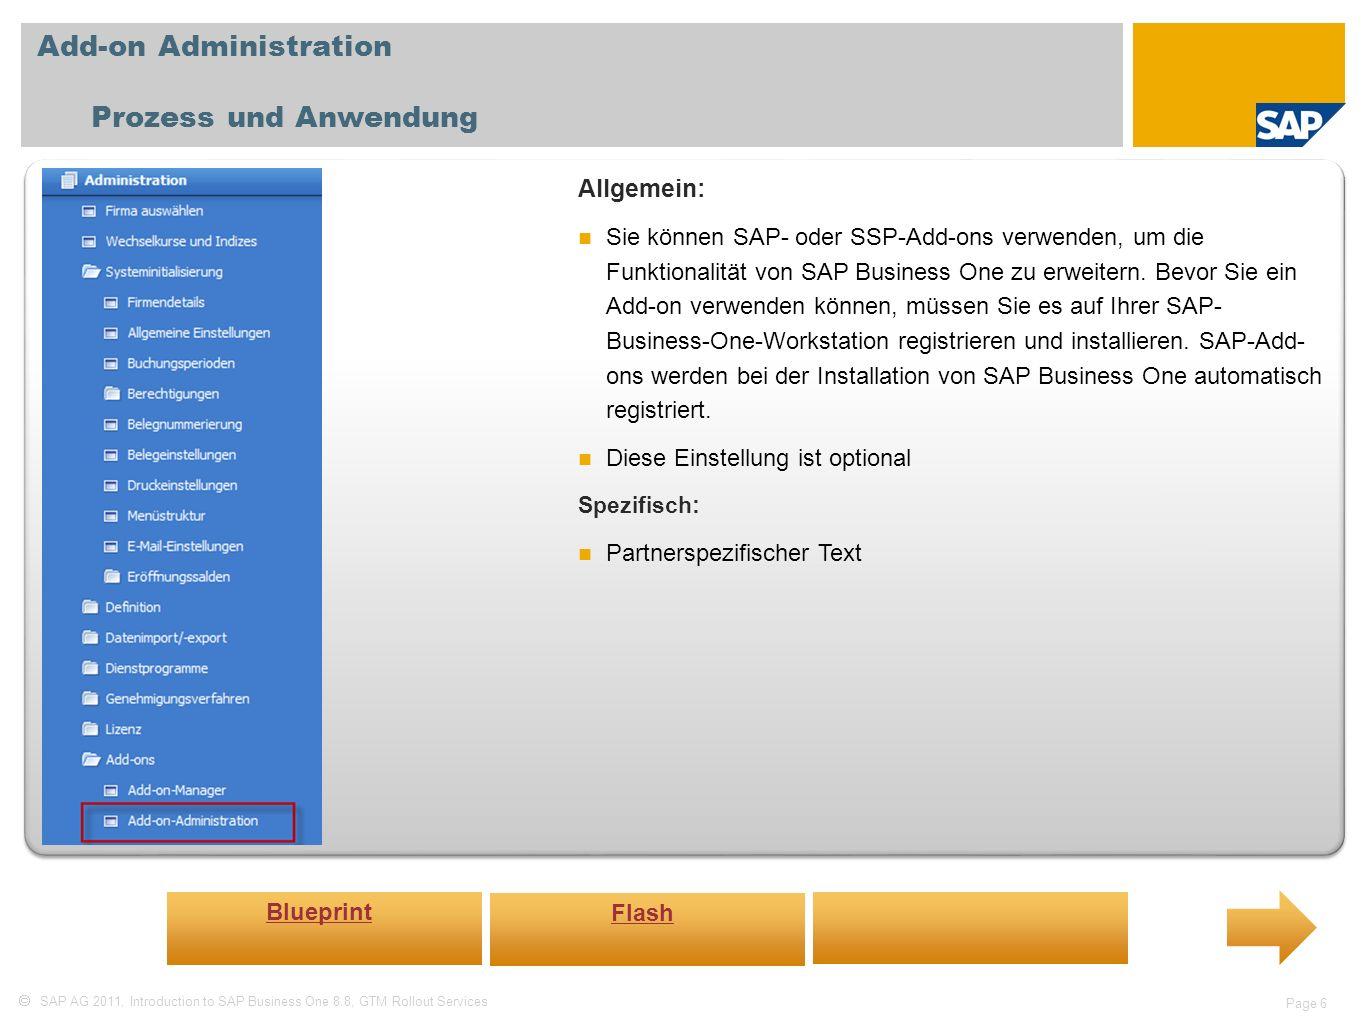 SAP AG 2011, Introduction to SAP Business One 8.8, GTM Rollout Services Page 7 Sicherheit Prozess und Anwendung Allgemein: In SAP Business One 8.8 sorgen u.a.